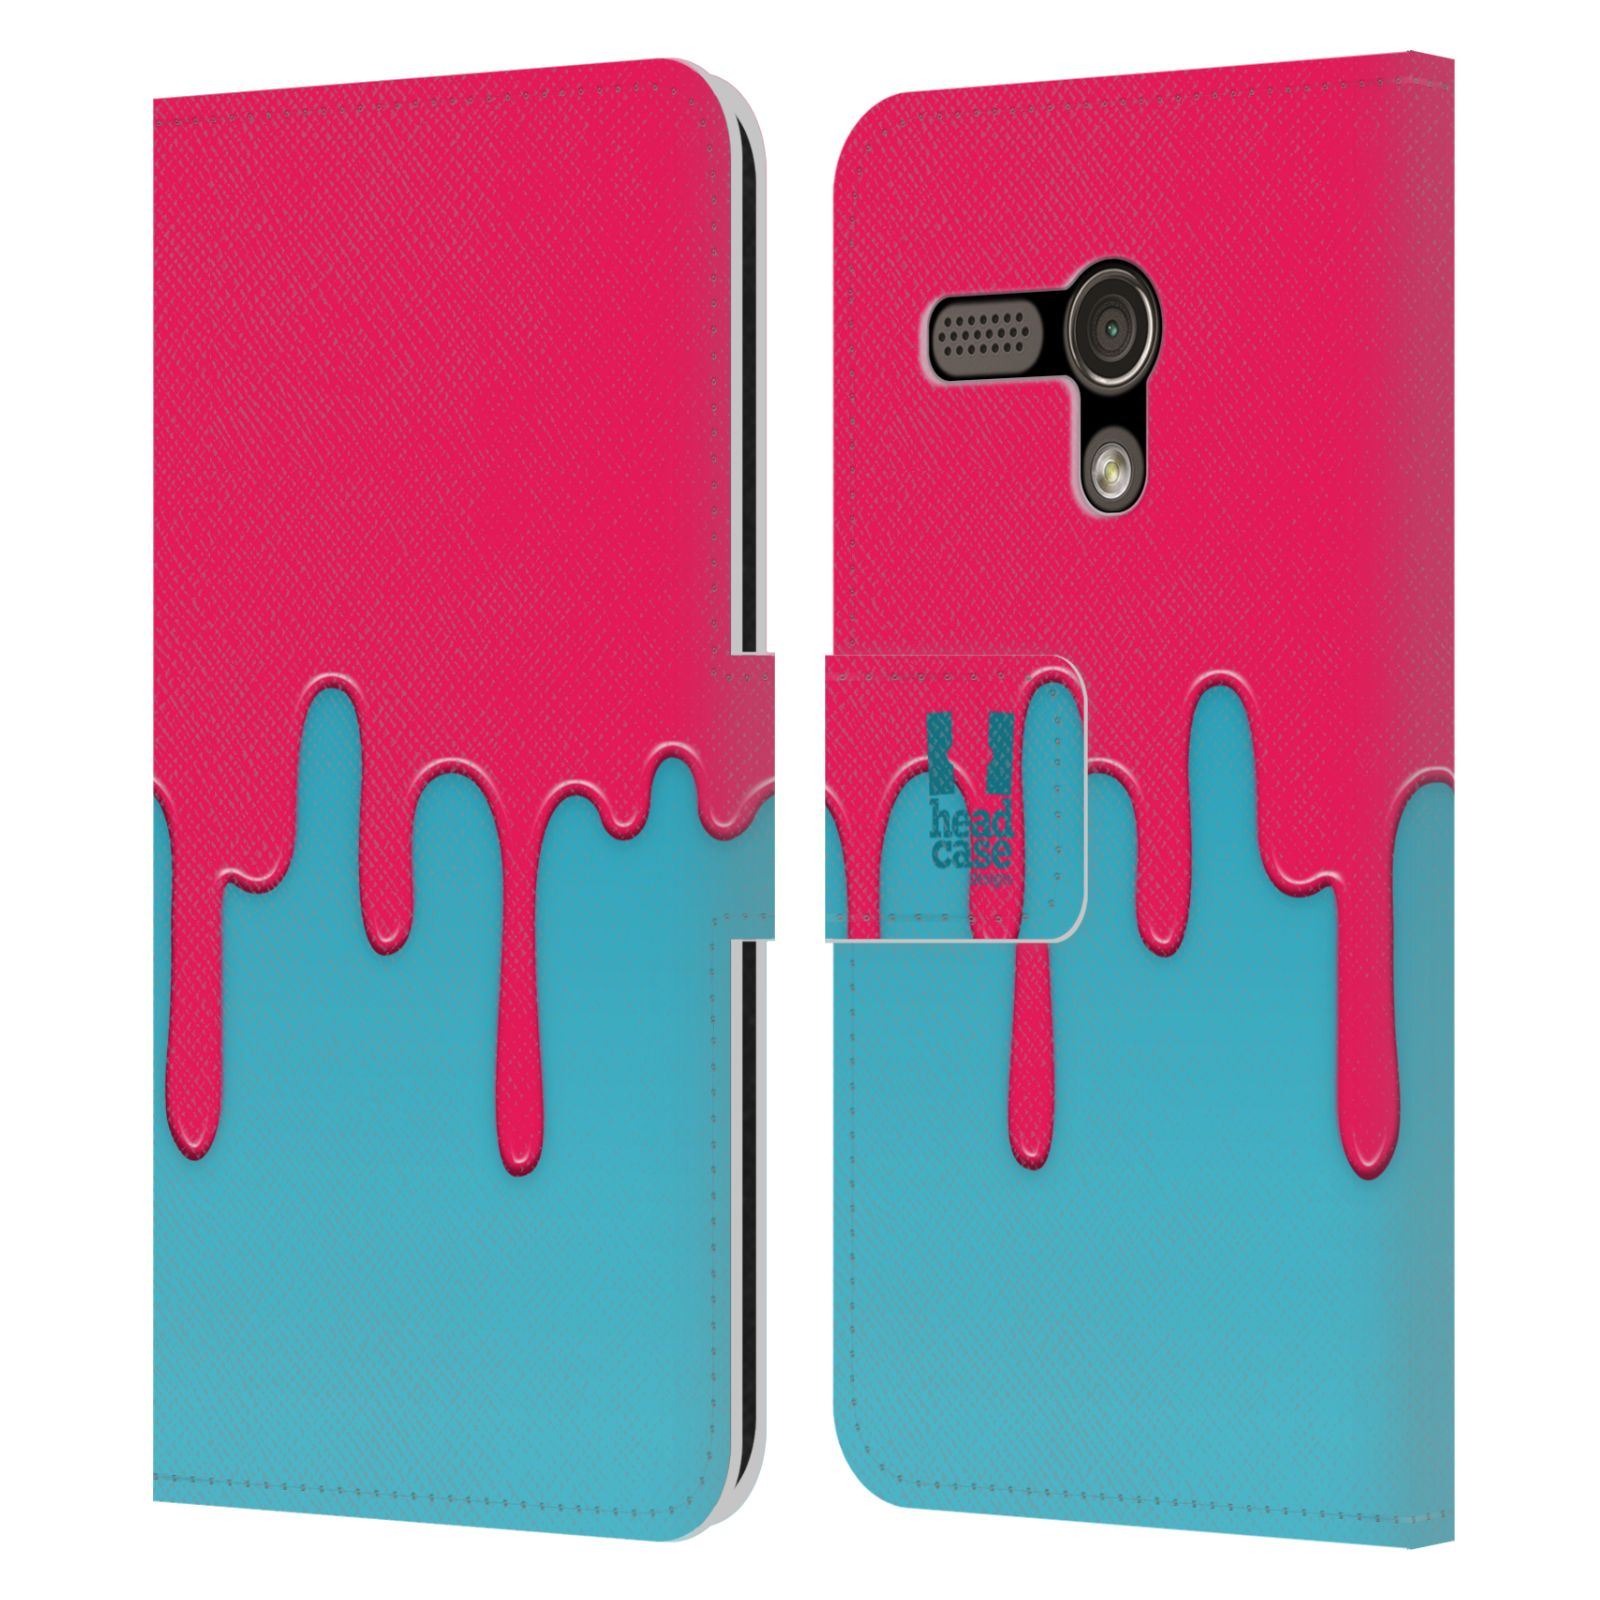 HEAD CASE Flipové pouzdro pro mobil MOTOROLA MOTO G Rozlitá barva růžová a modrá